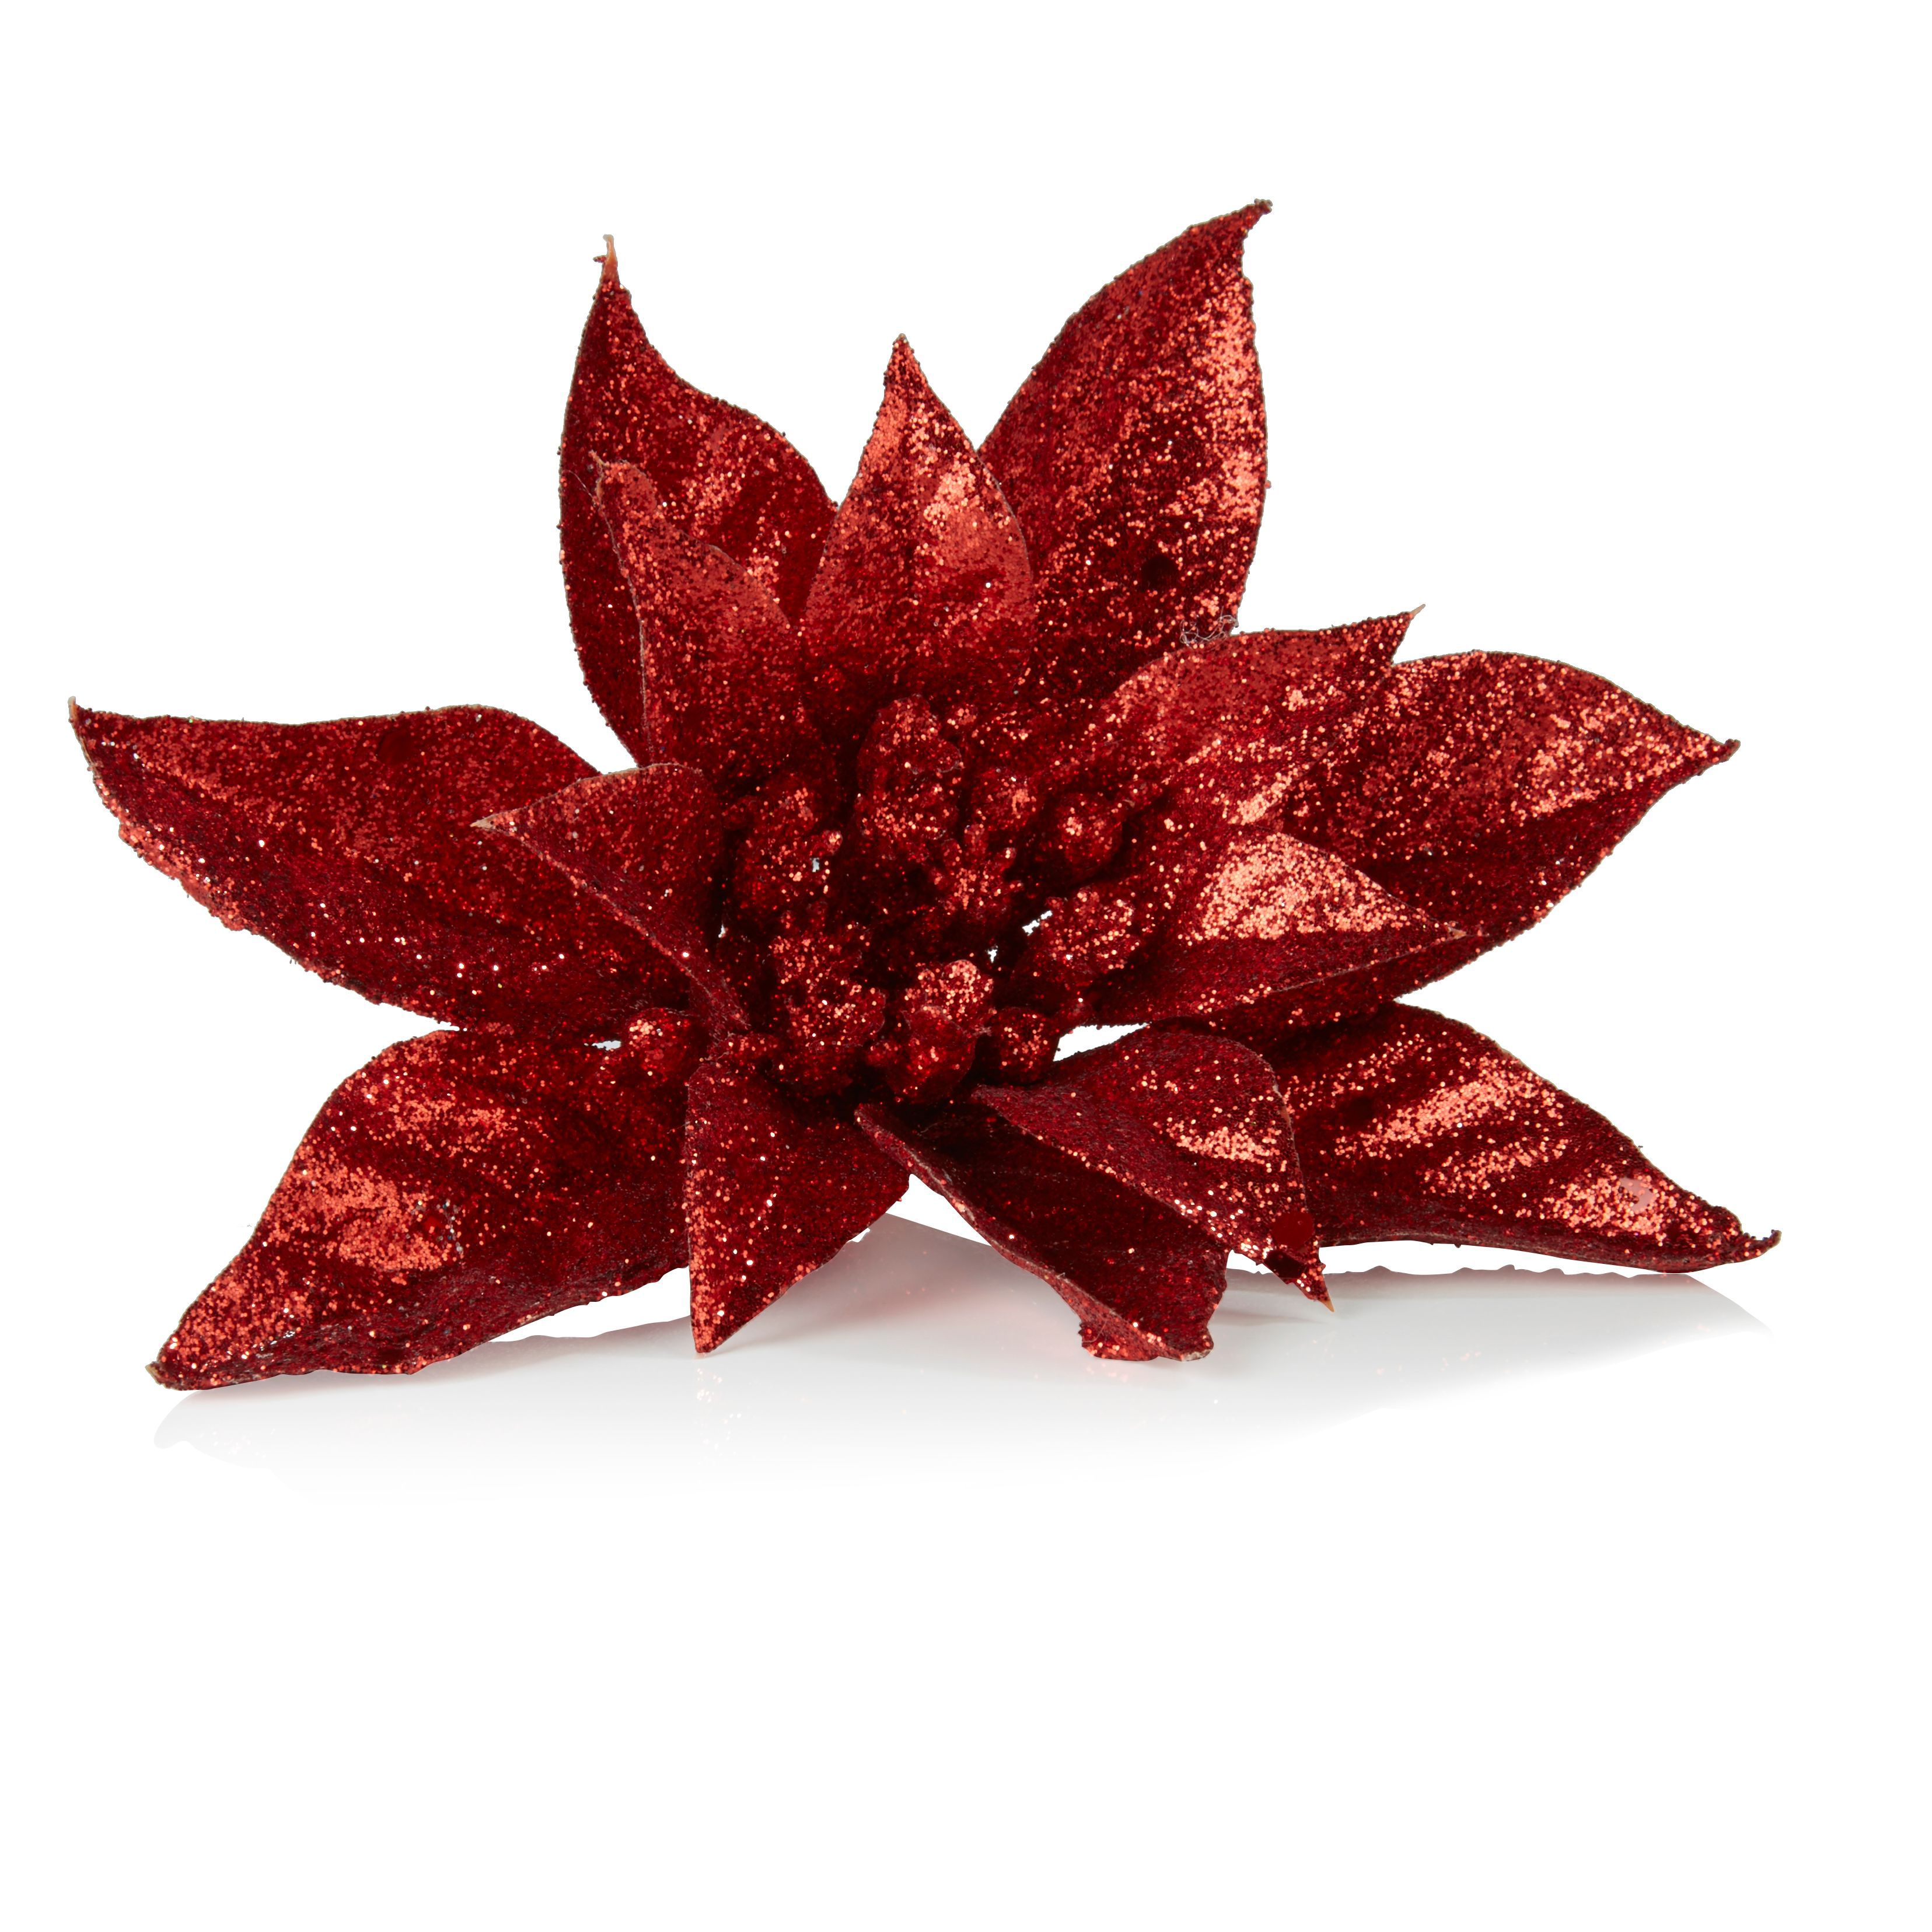 Glitter Red Poinsettia Tree Decoration